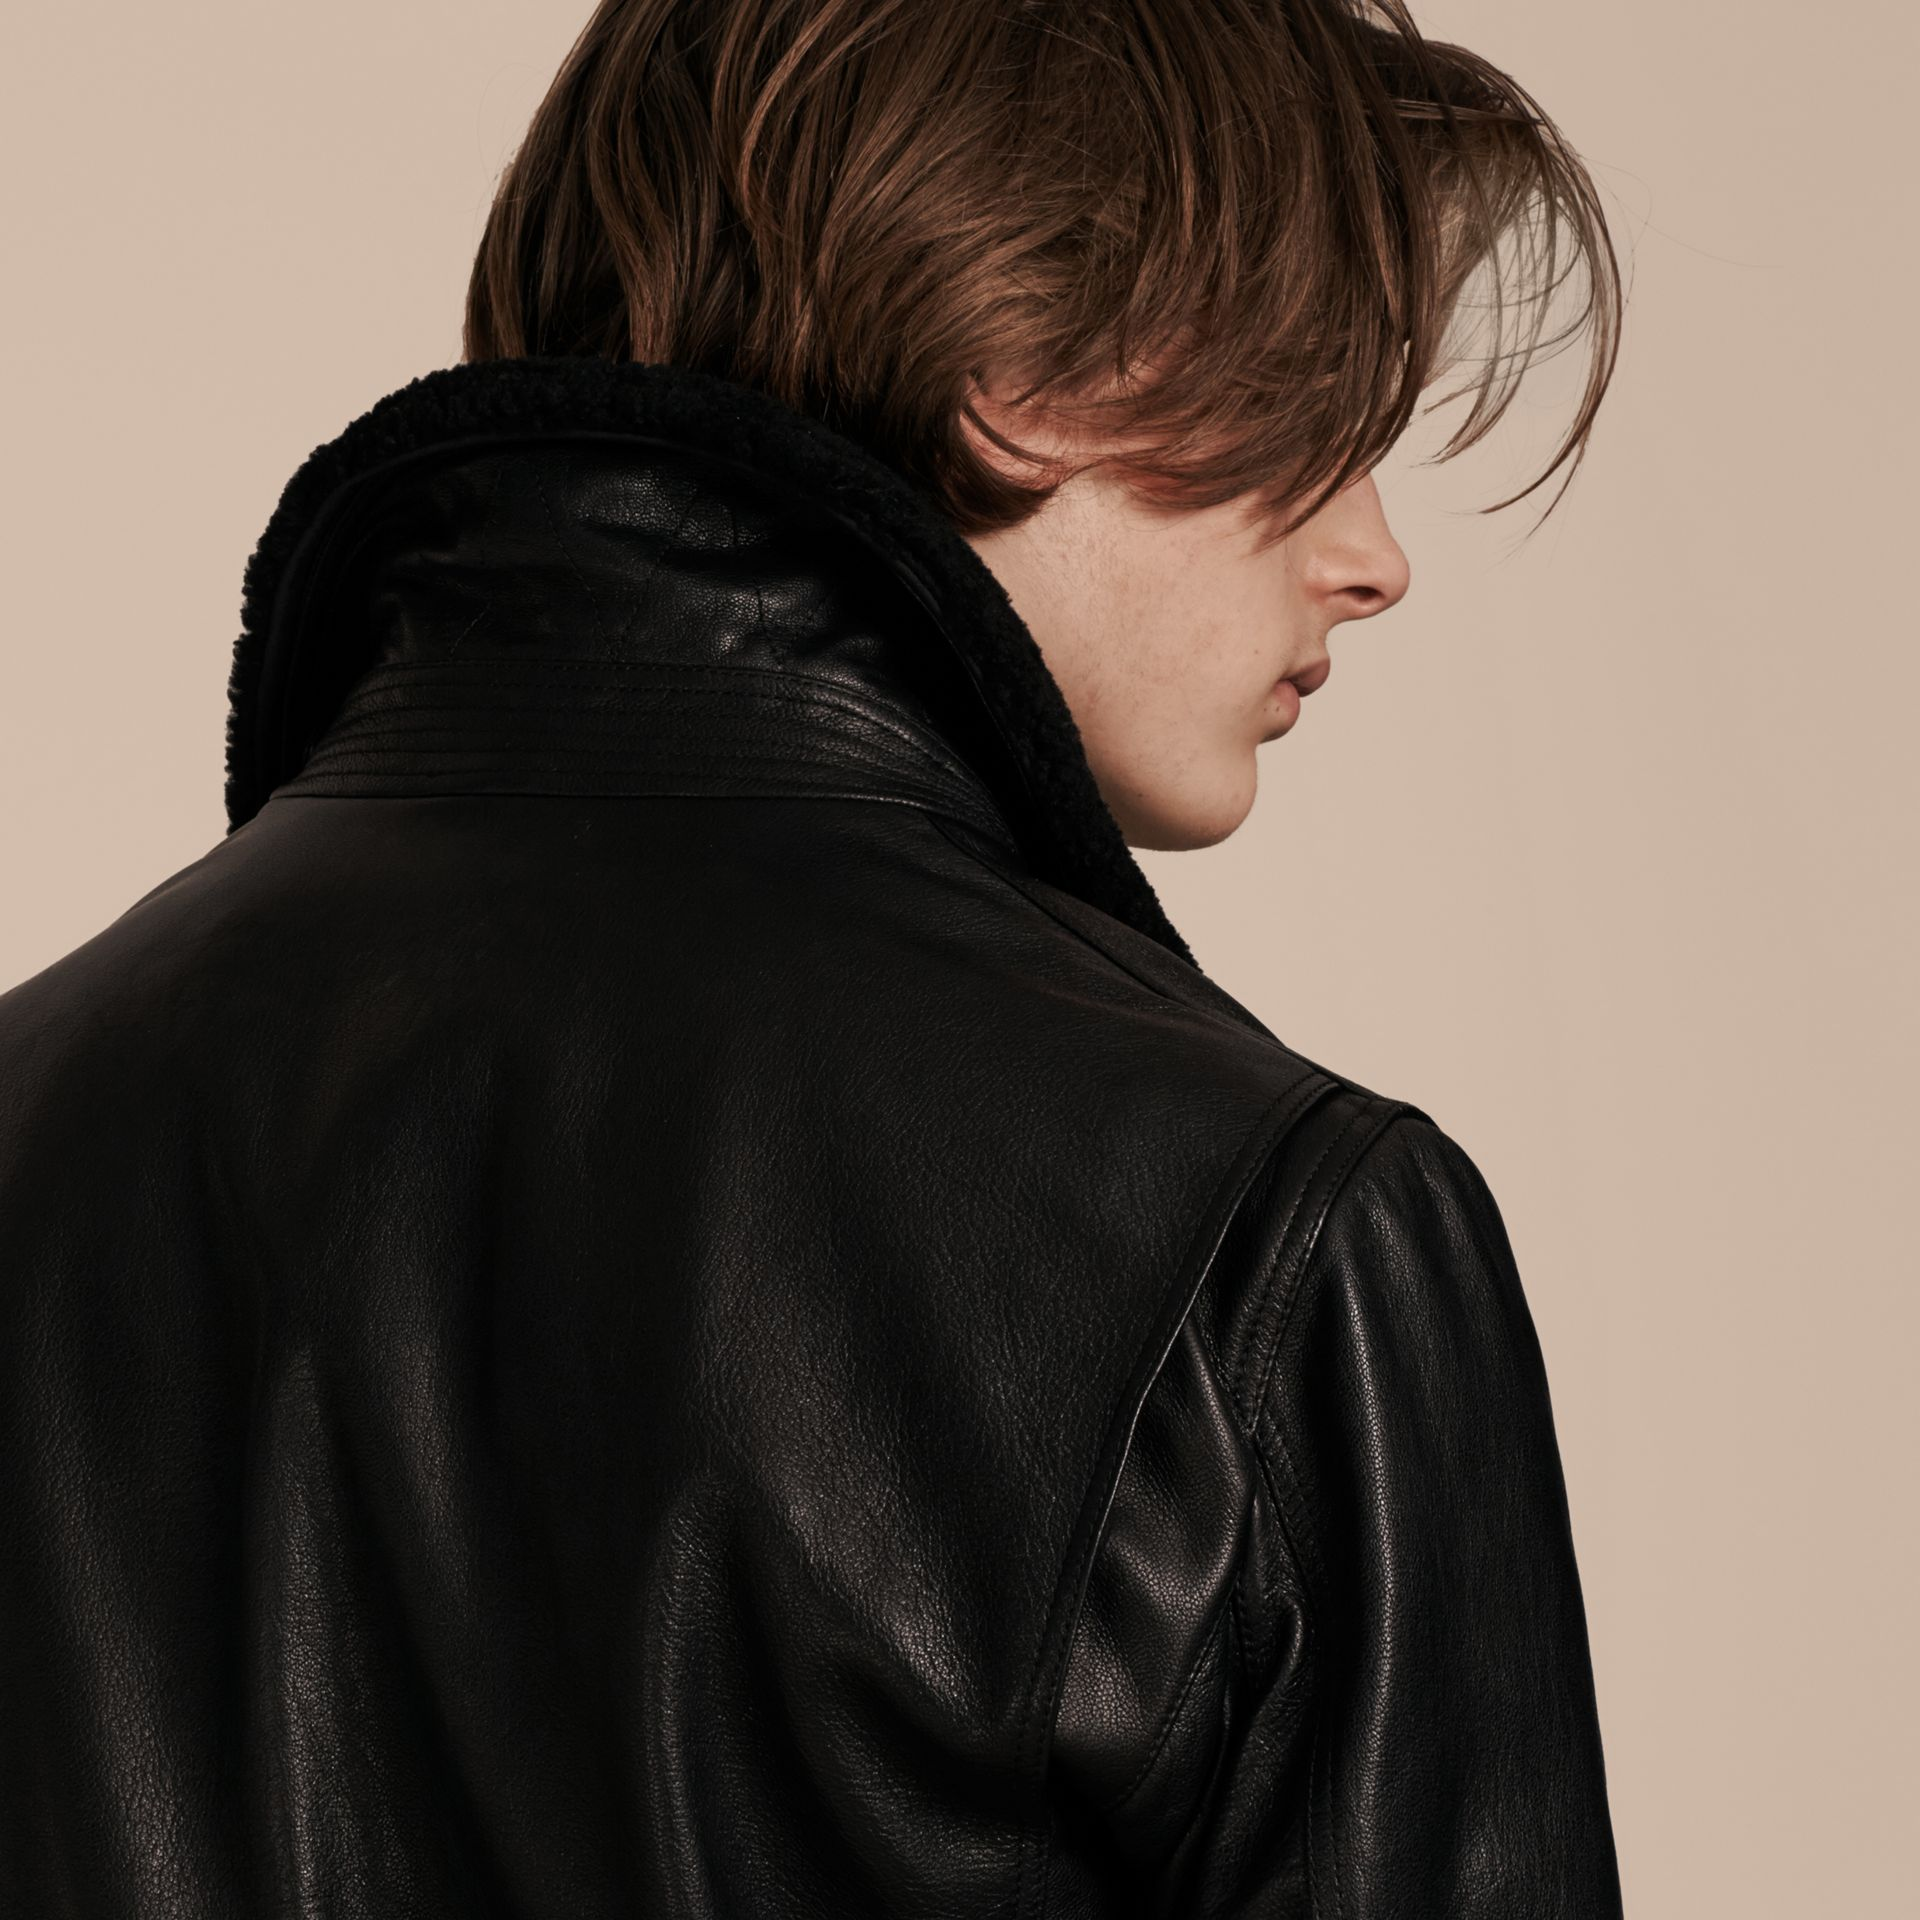 Noir Veste en cuir avec col en shearling amovible - photo de la galerie 6